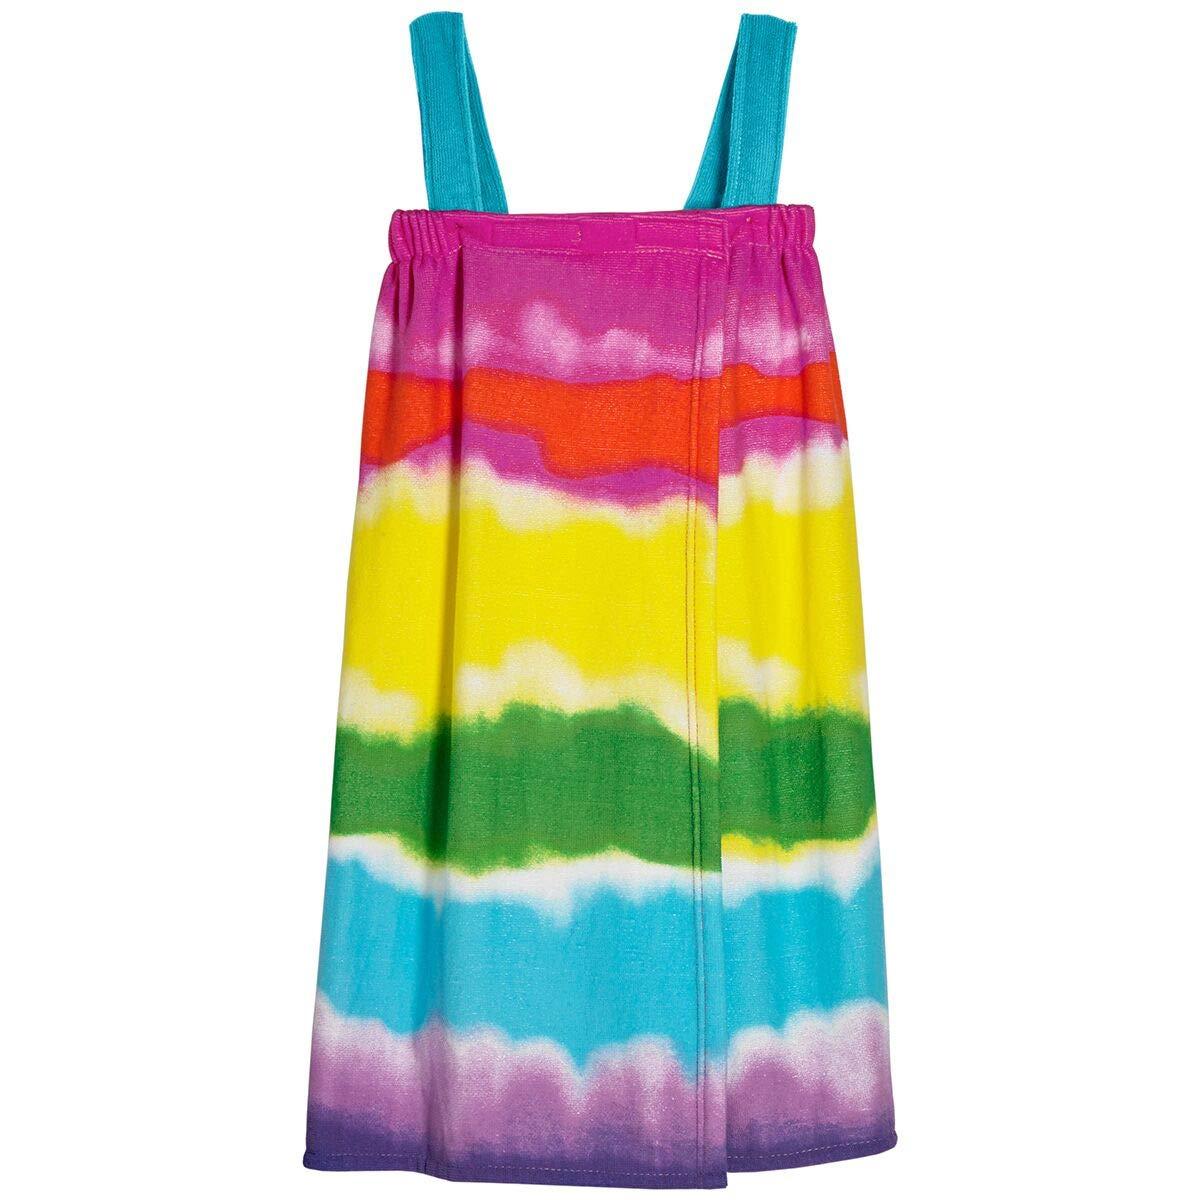 3C4G Teens Shower Beach Wrap (Tie Dye, M/L-26)